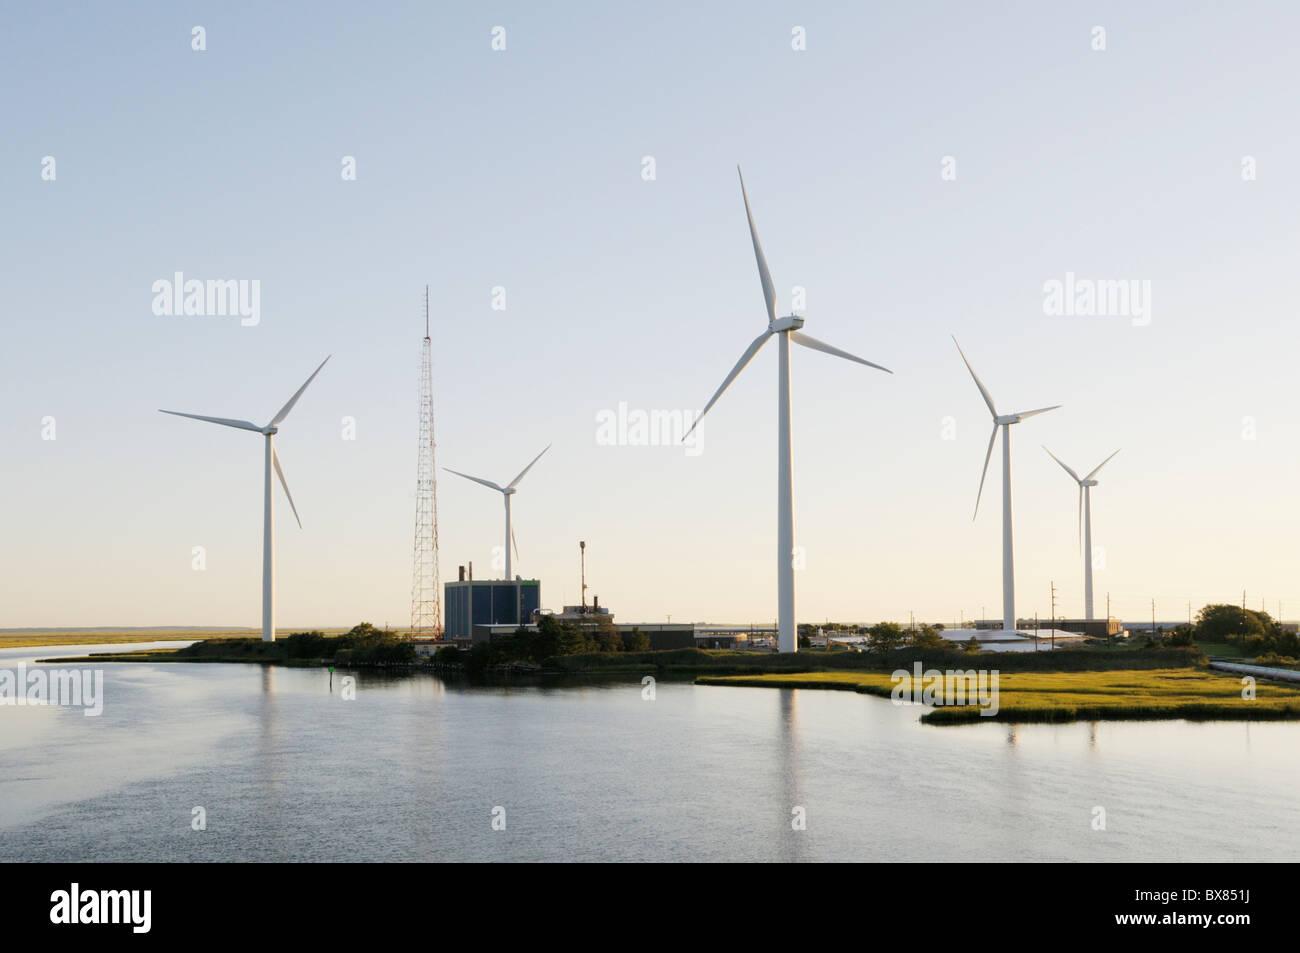 Jersey-Atlantic wind farm, first wind farm in New Jersey - Stock Image